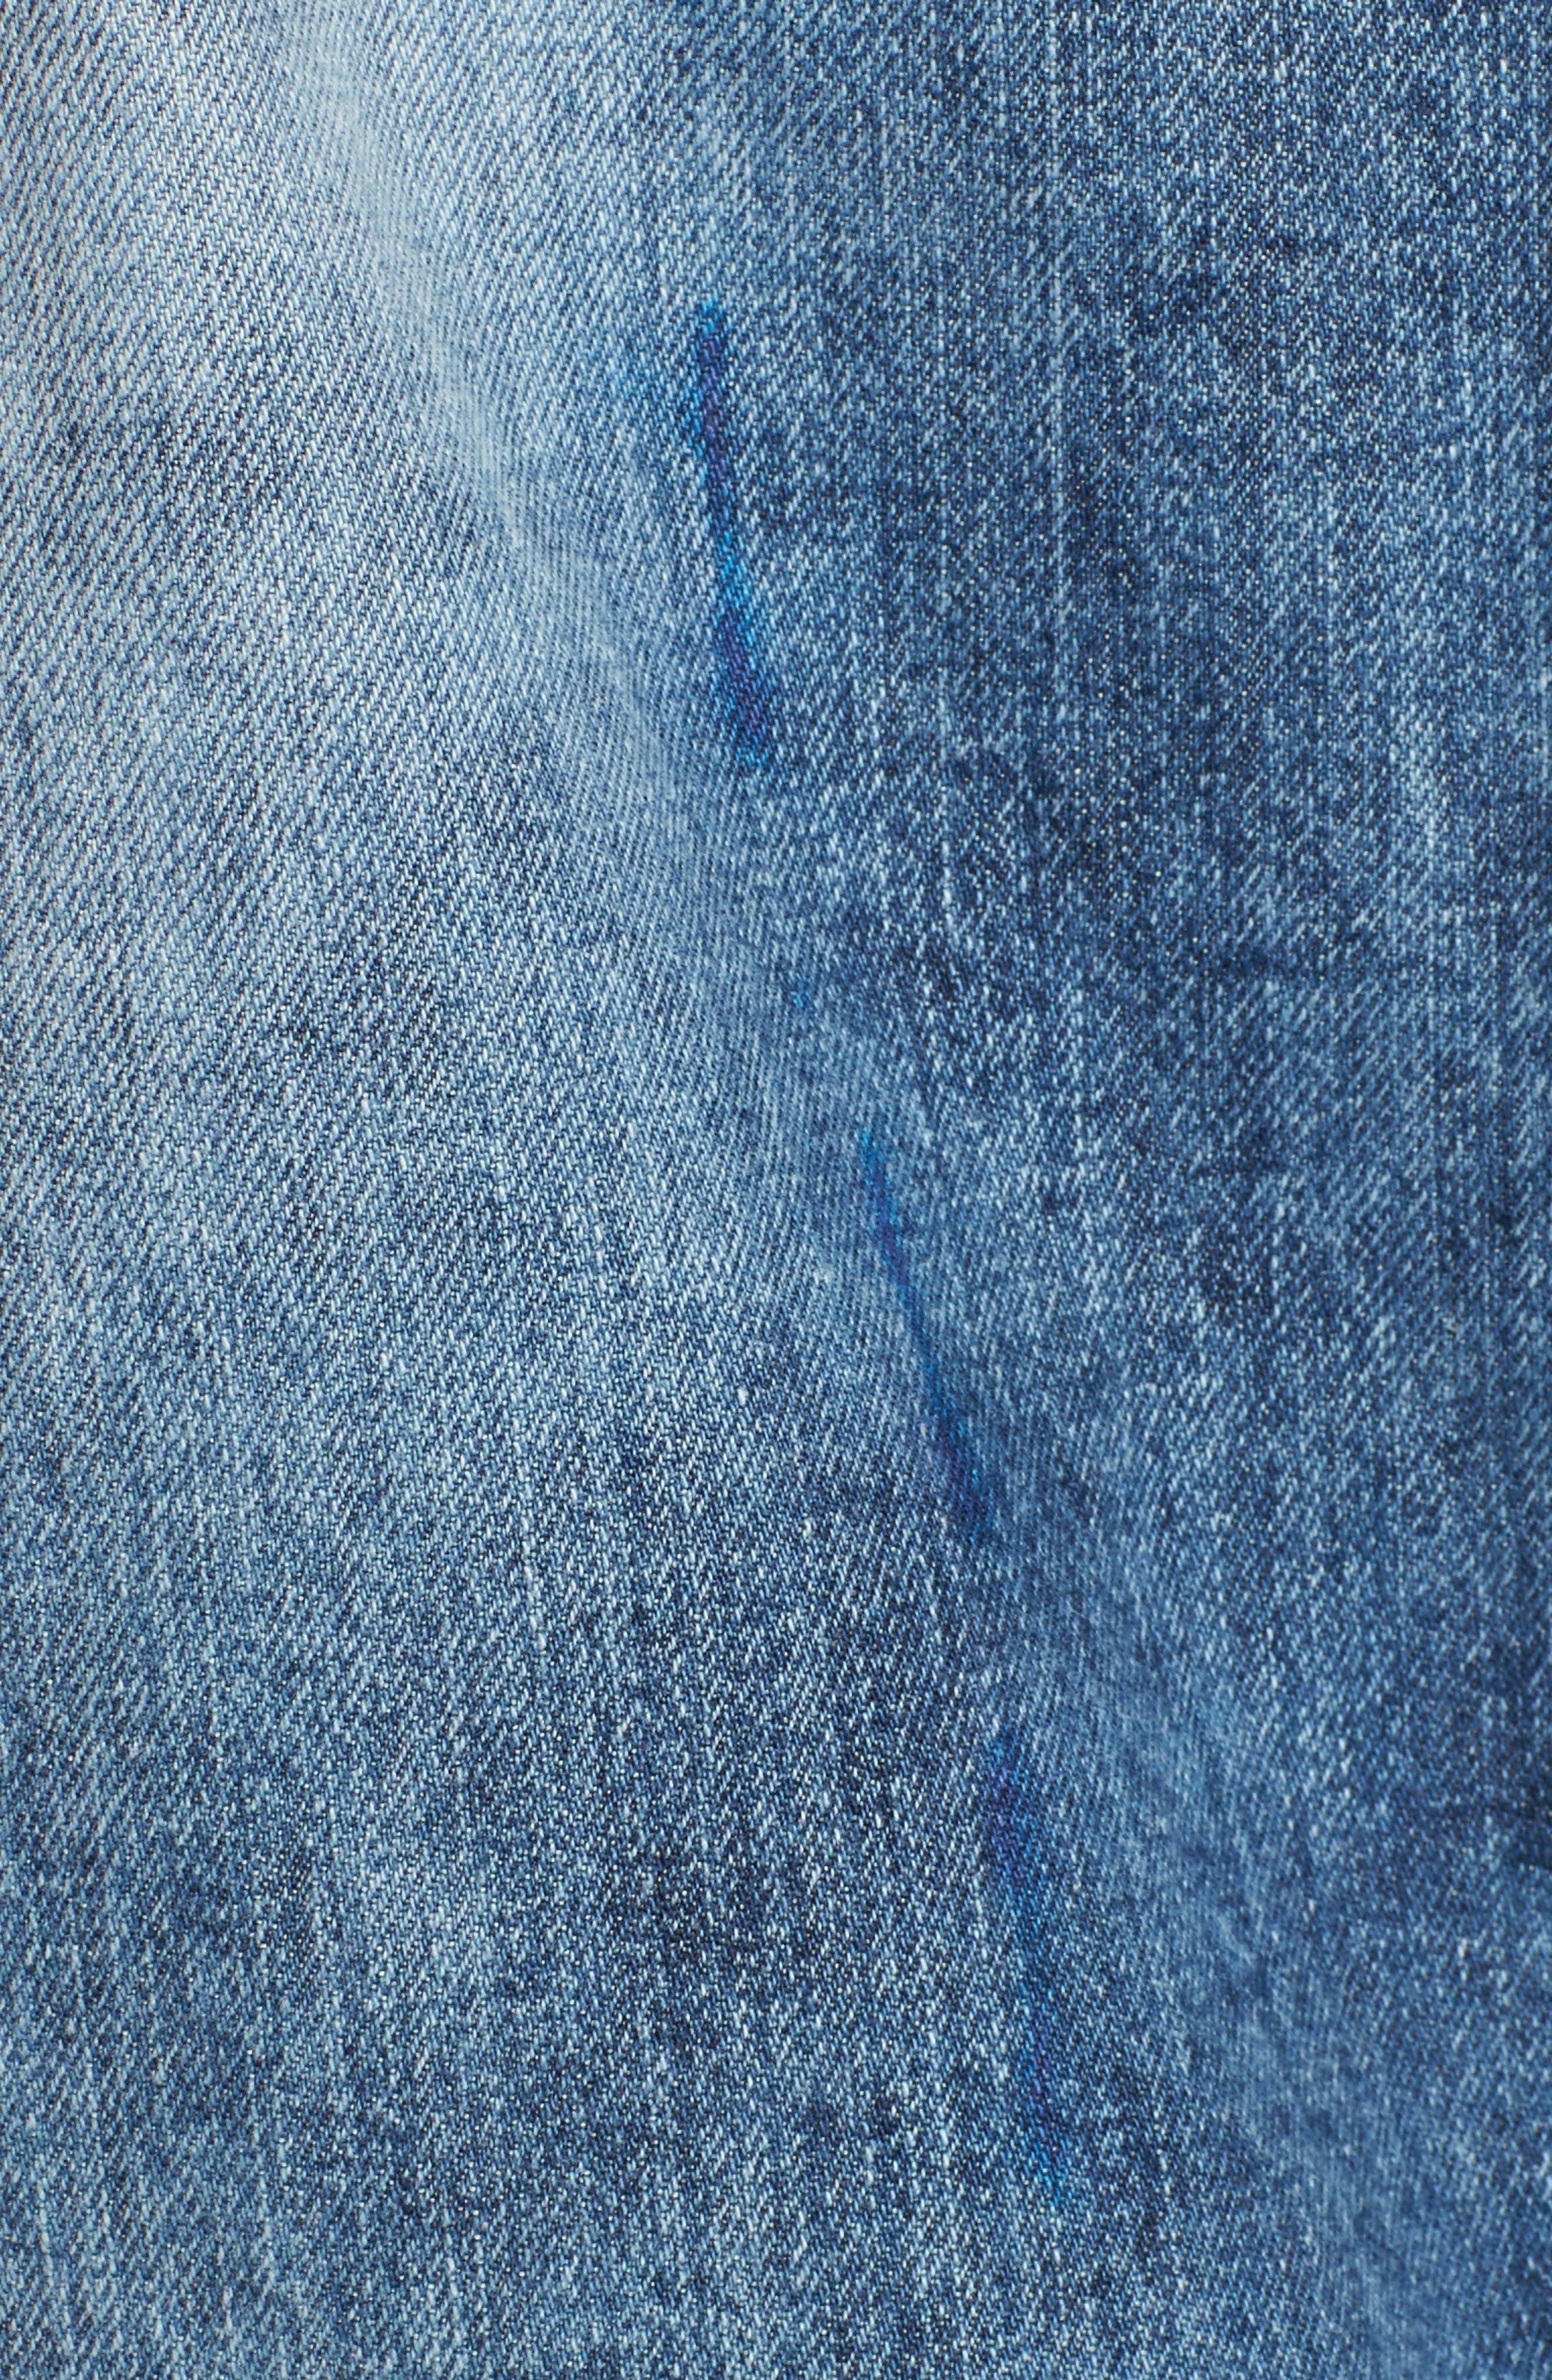 Denim Jacket,                             Alternate thumbnail 5, color,                             Rainy Medium Wash